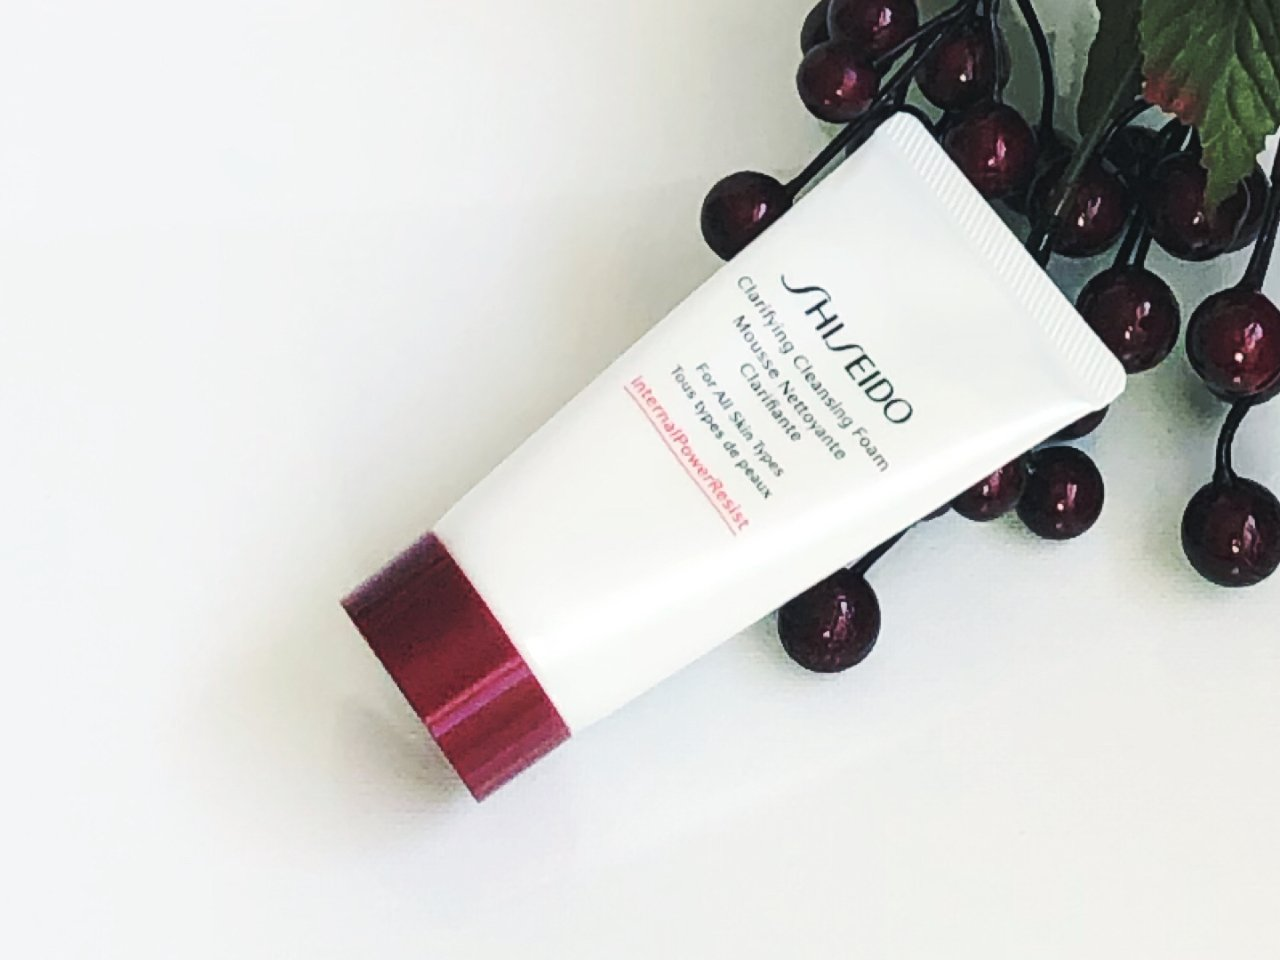 秋日里的选择 | Shiseido...